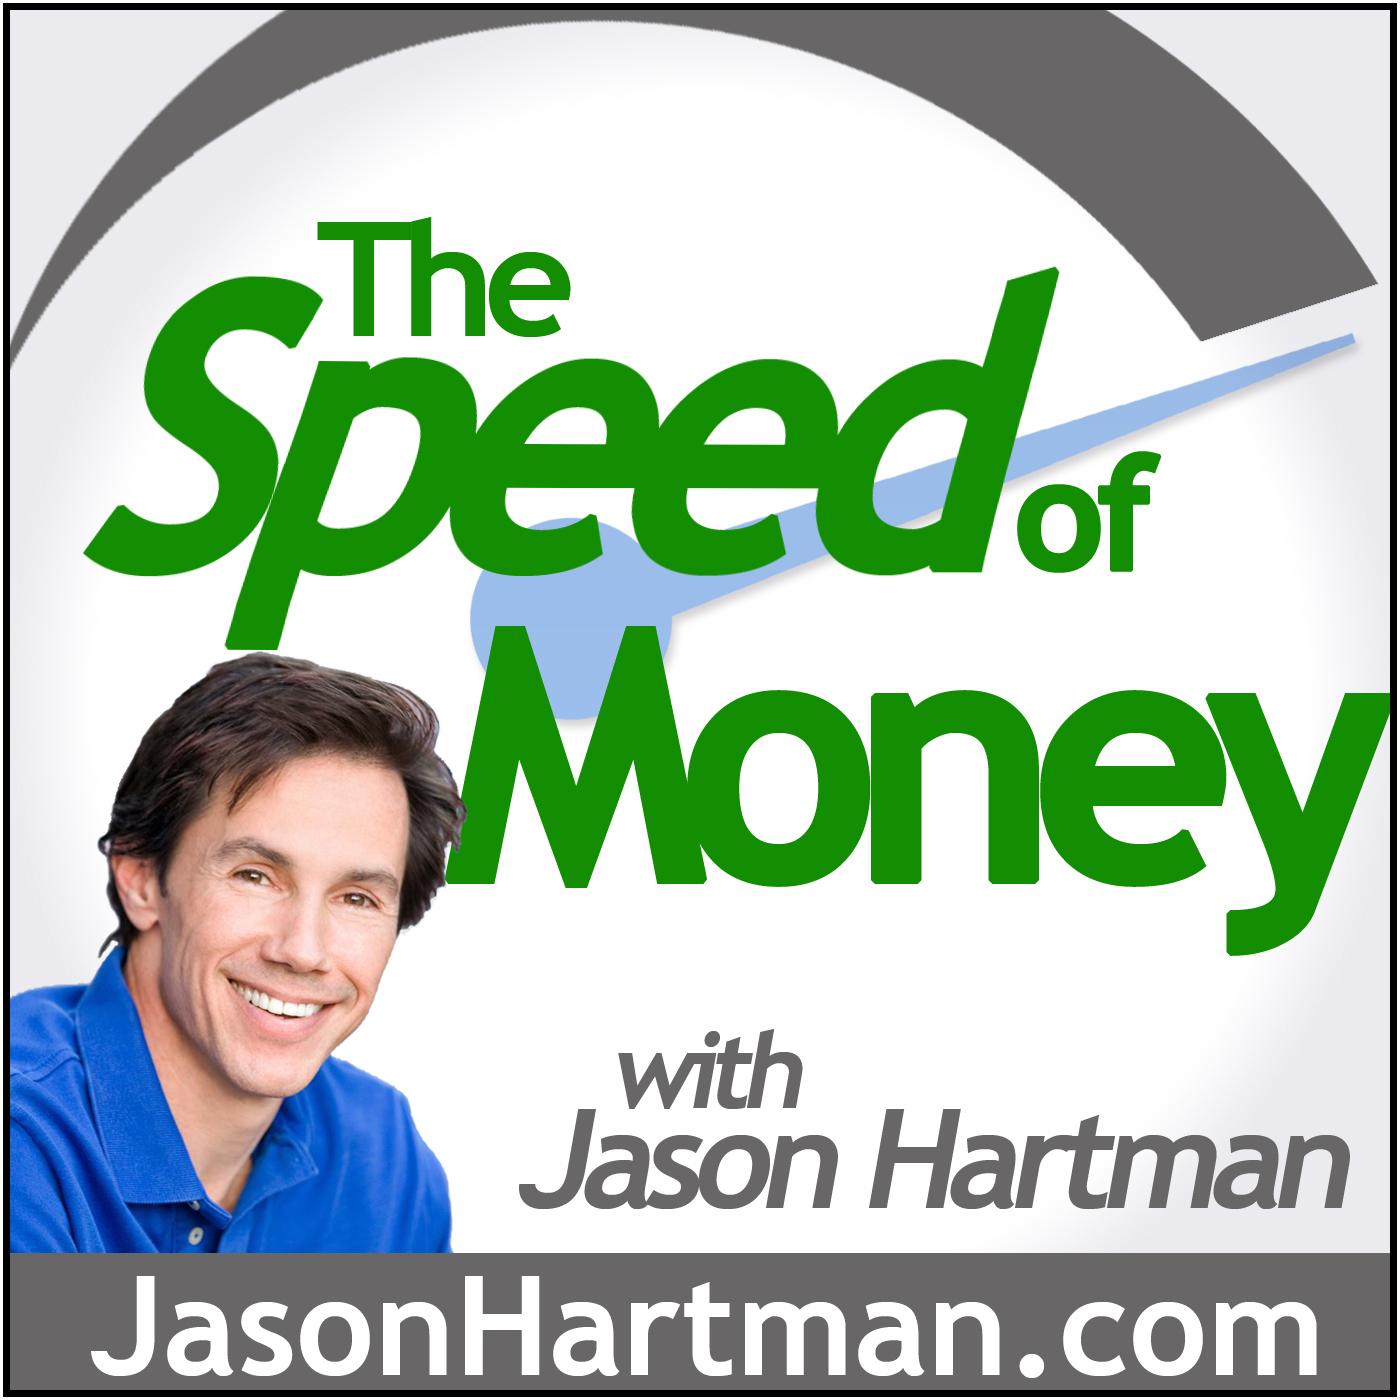 Jason Hartman's The Speed of Money Podcast